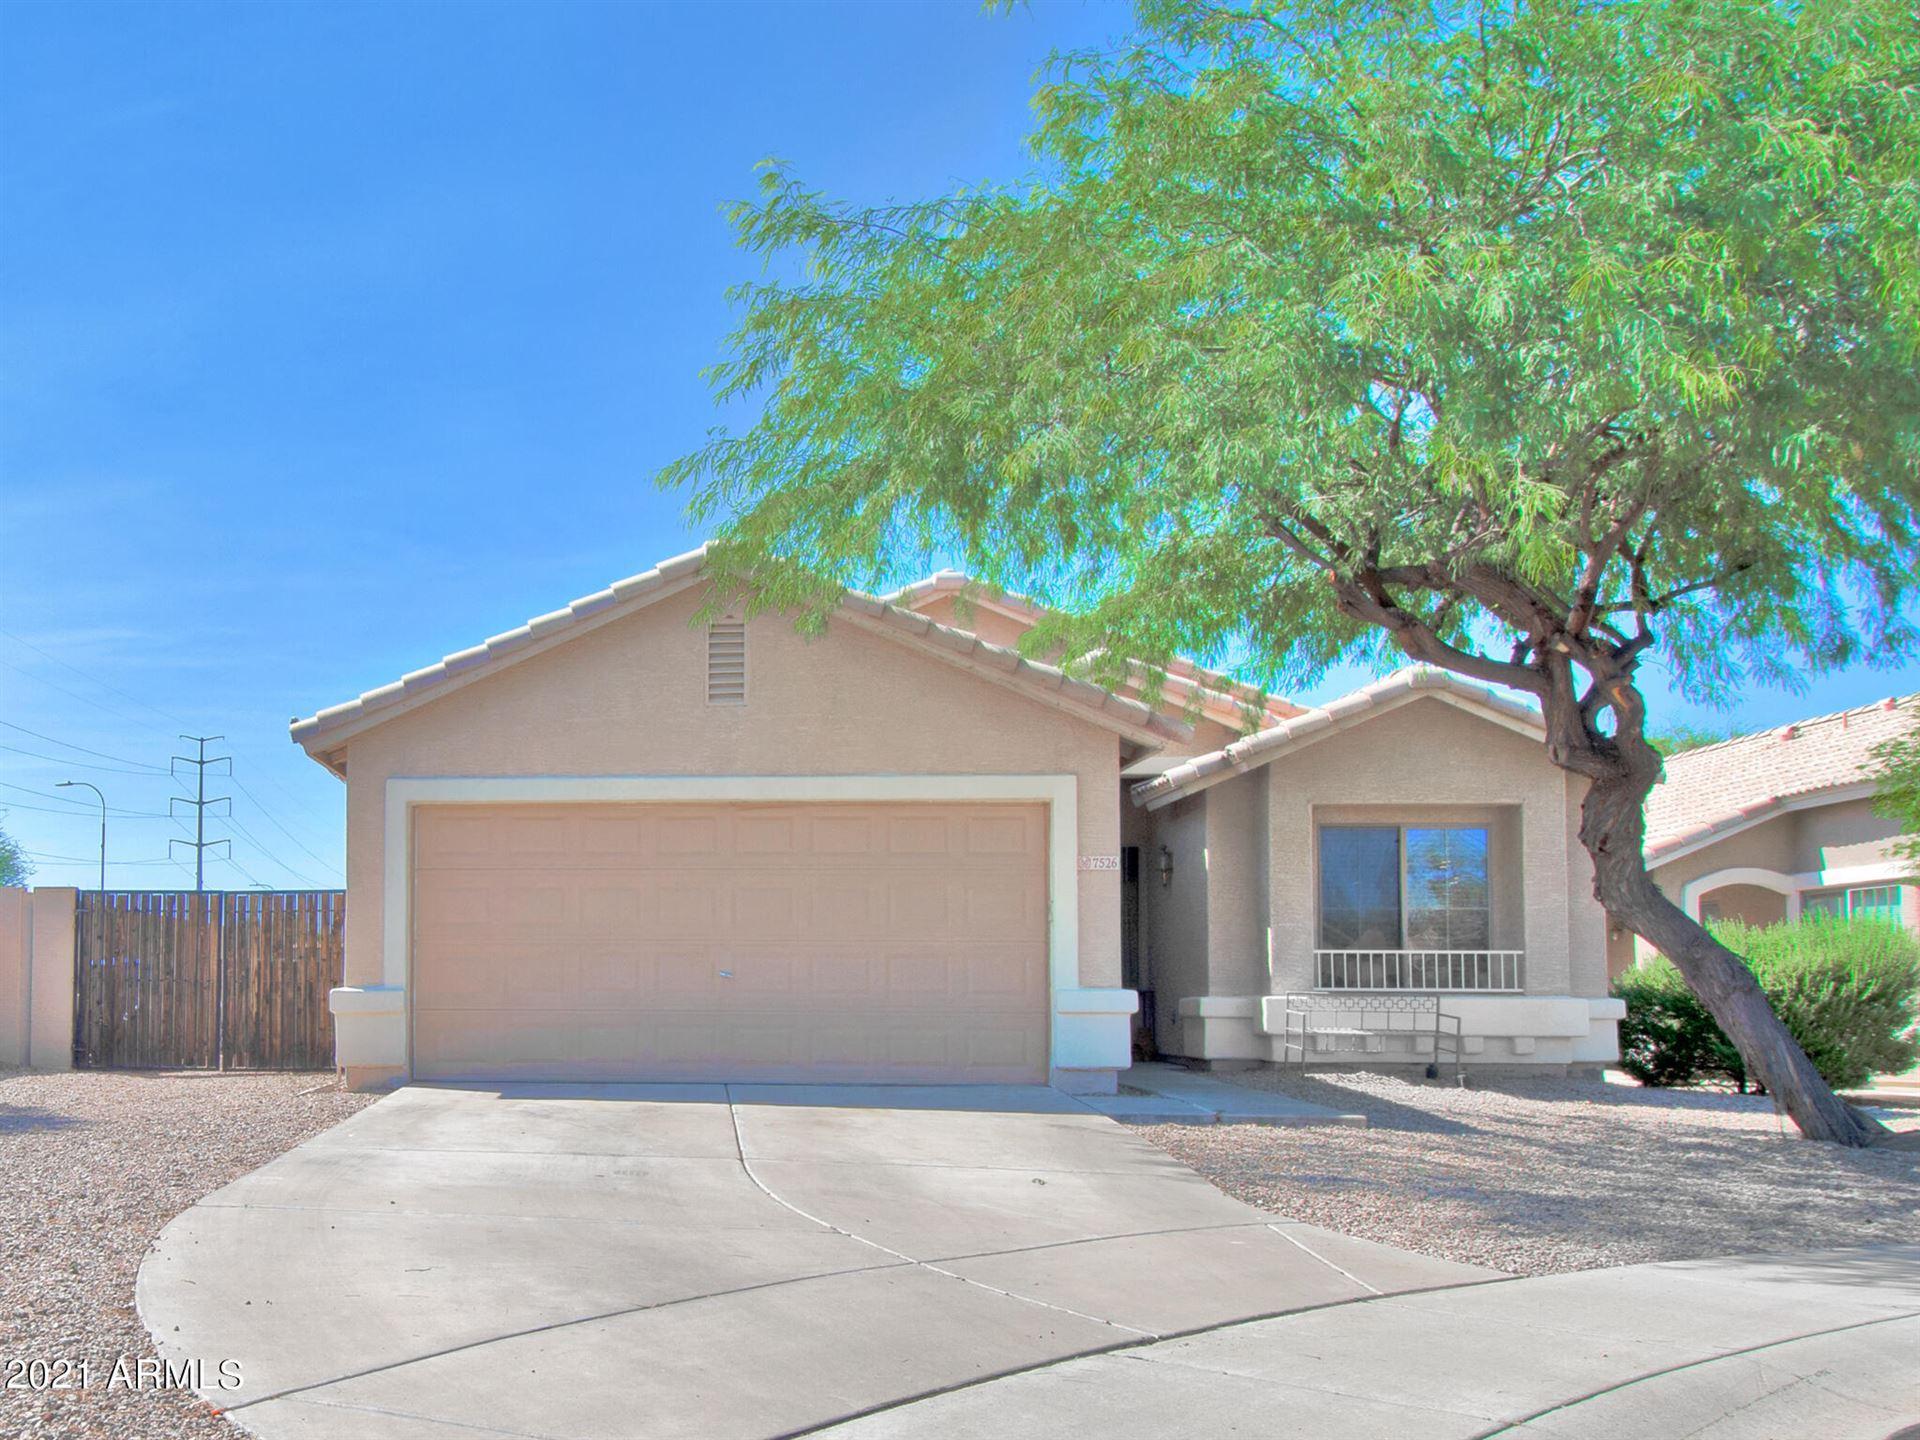 7526 S 43RD Drive, Laveen, AZ 85339 - MLS#: 6293691